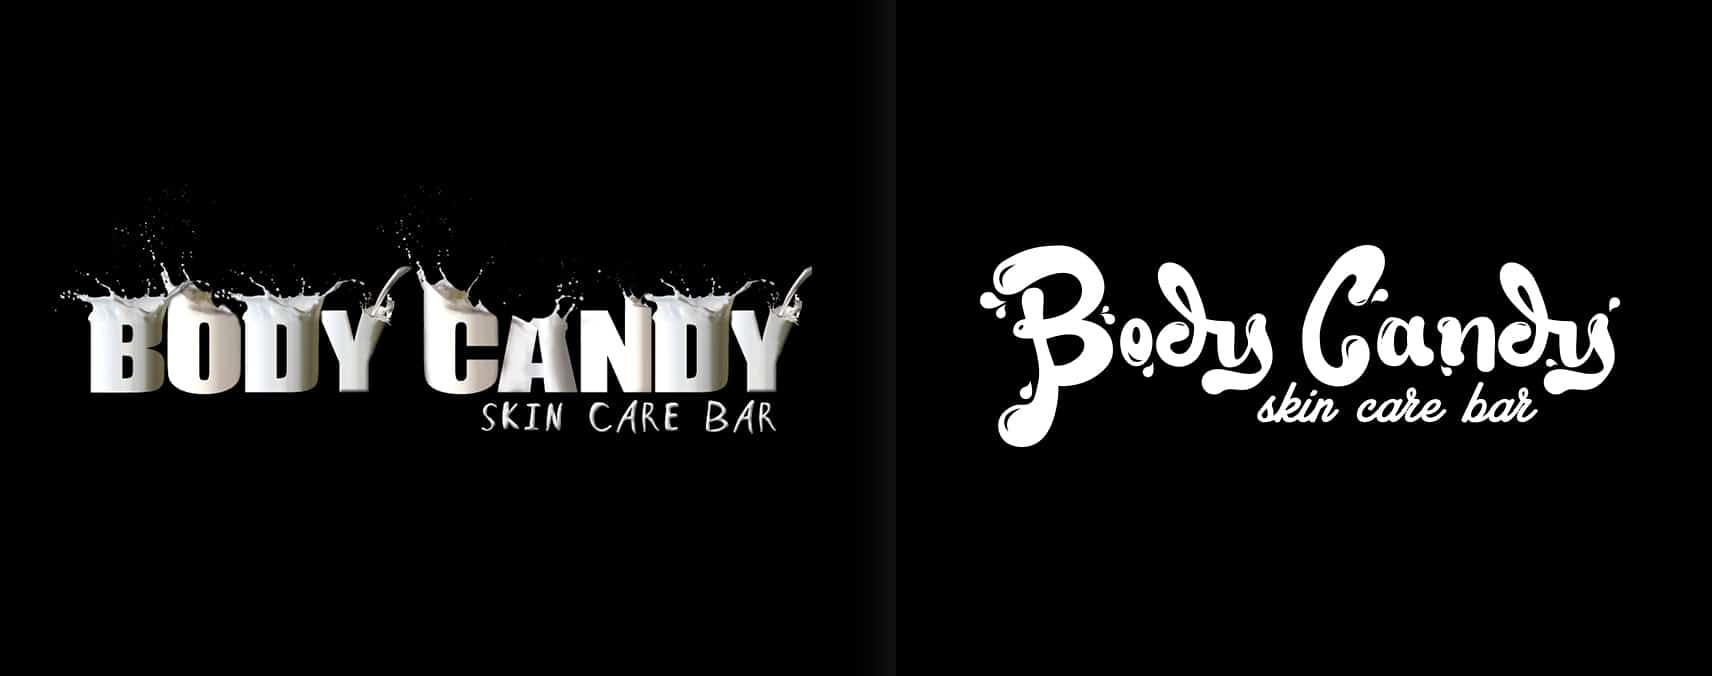 rediseño de logotipo body candy